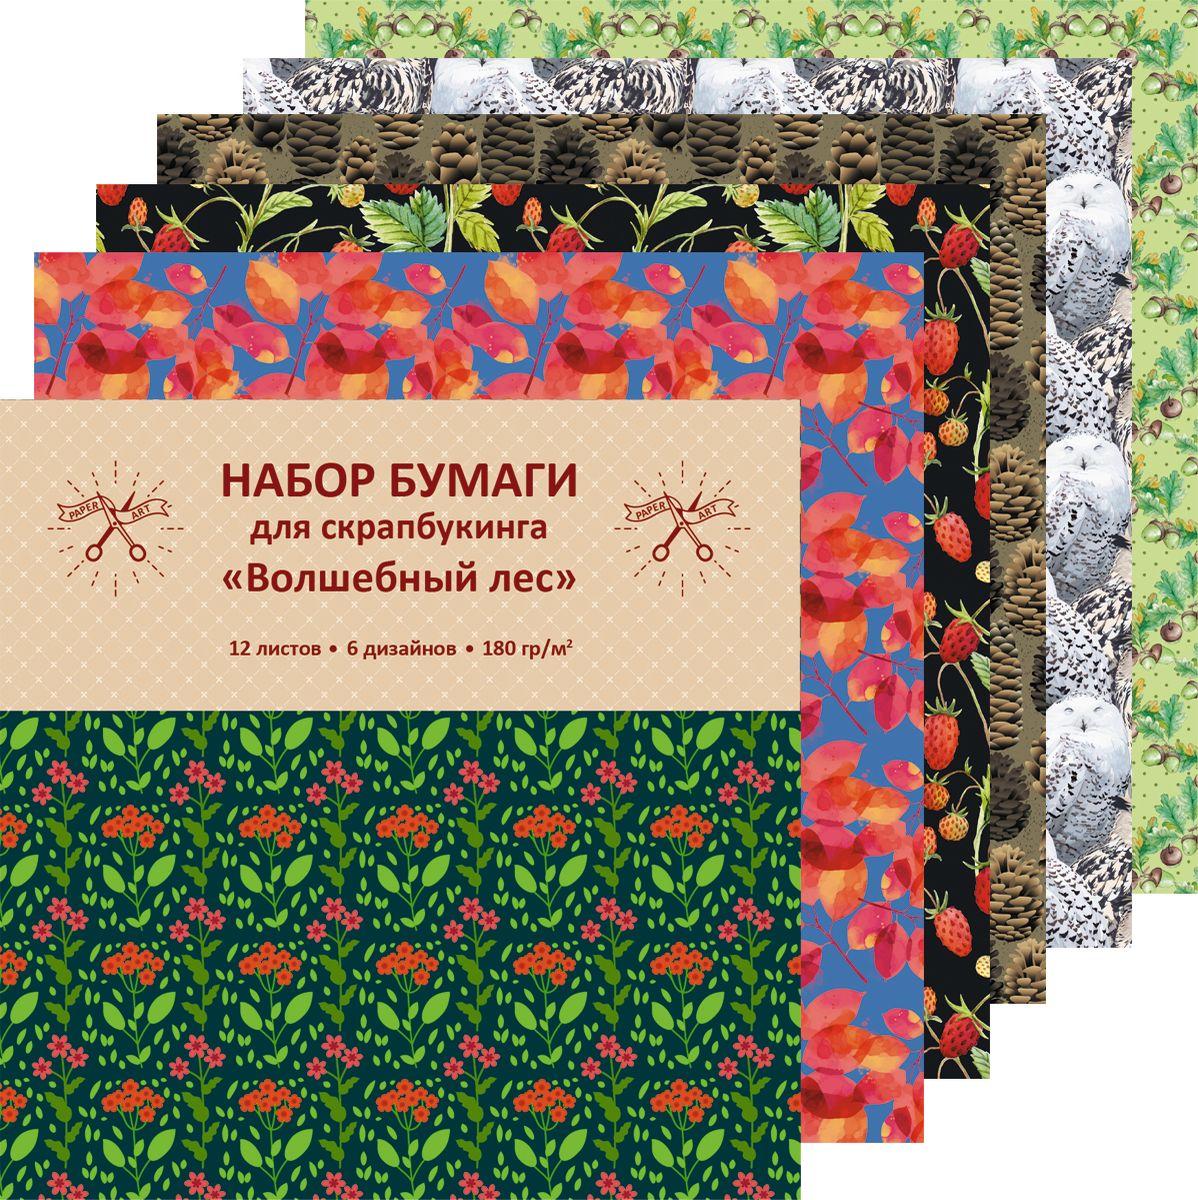 Канц-Эксмо Бумага для скрапбукинга Волшебный лес 330 х 330 мм александр григорьев волшебныйлес сказка